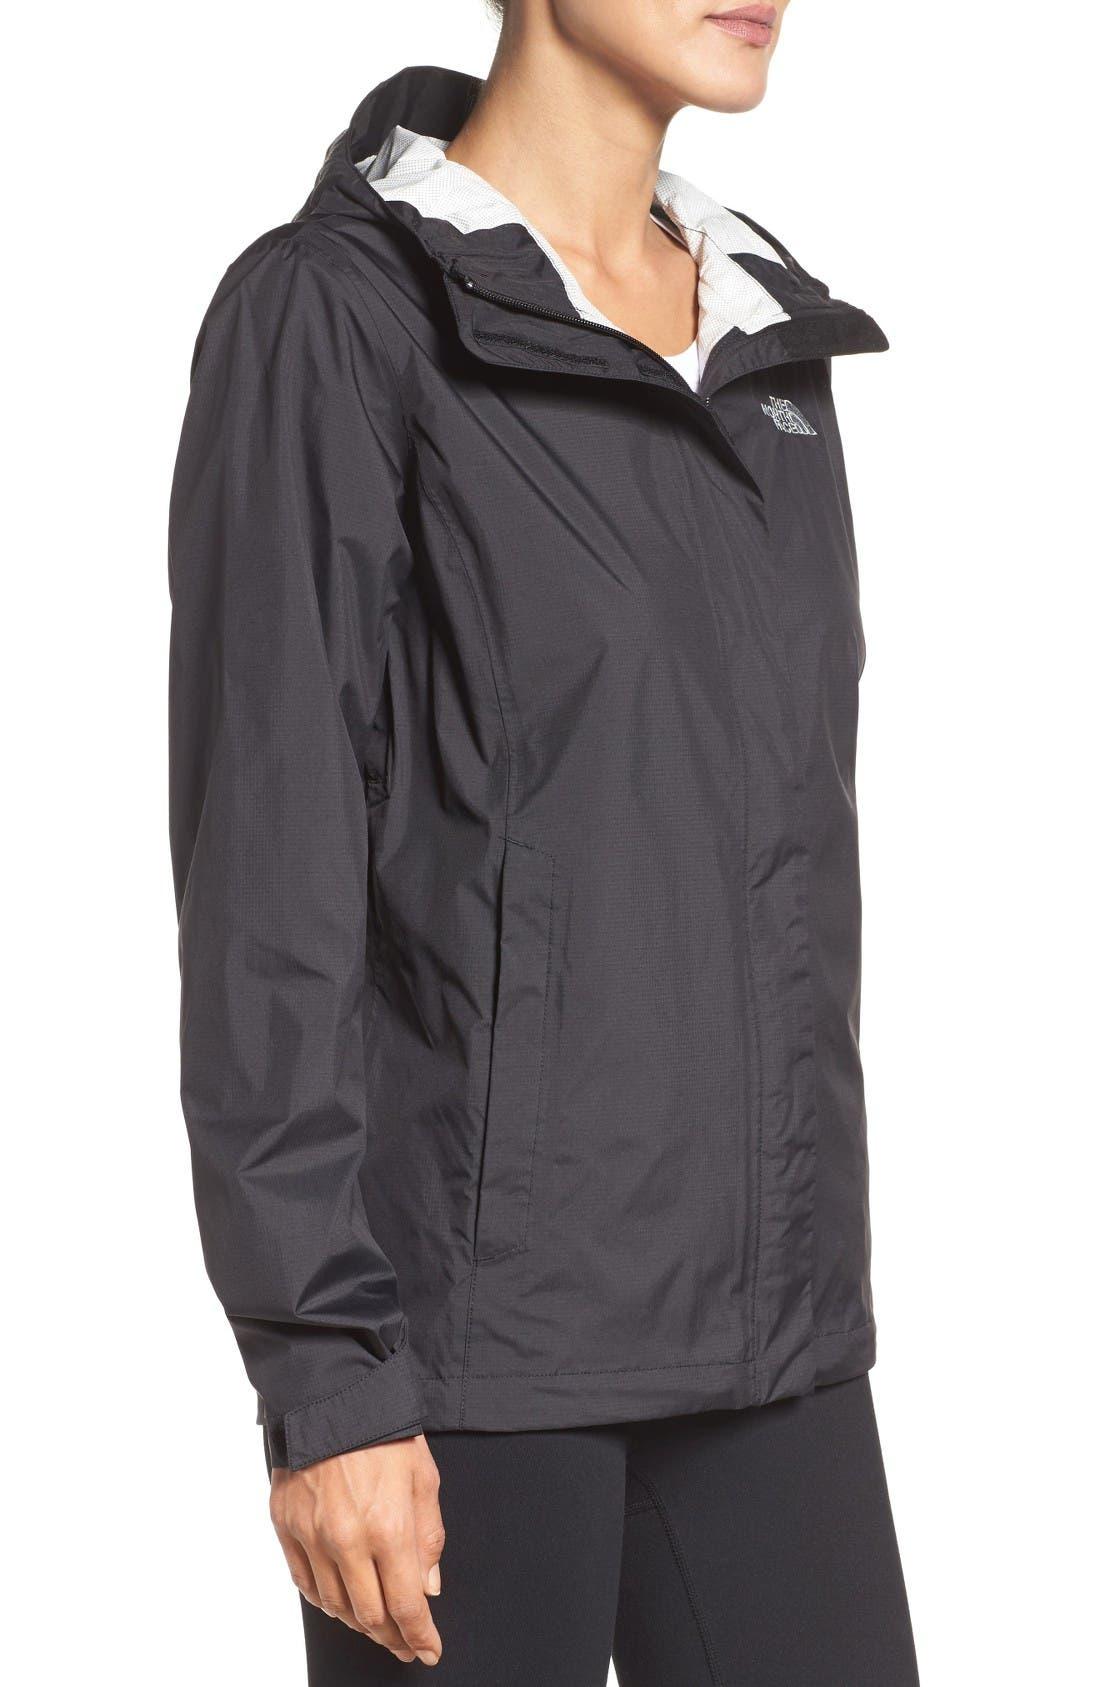 Venture 2 Waterproof Jacket,                             Alternate thumbnail 3, color,                             Tnf Black